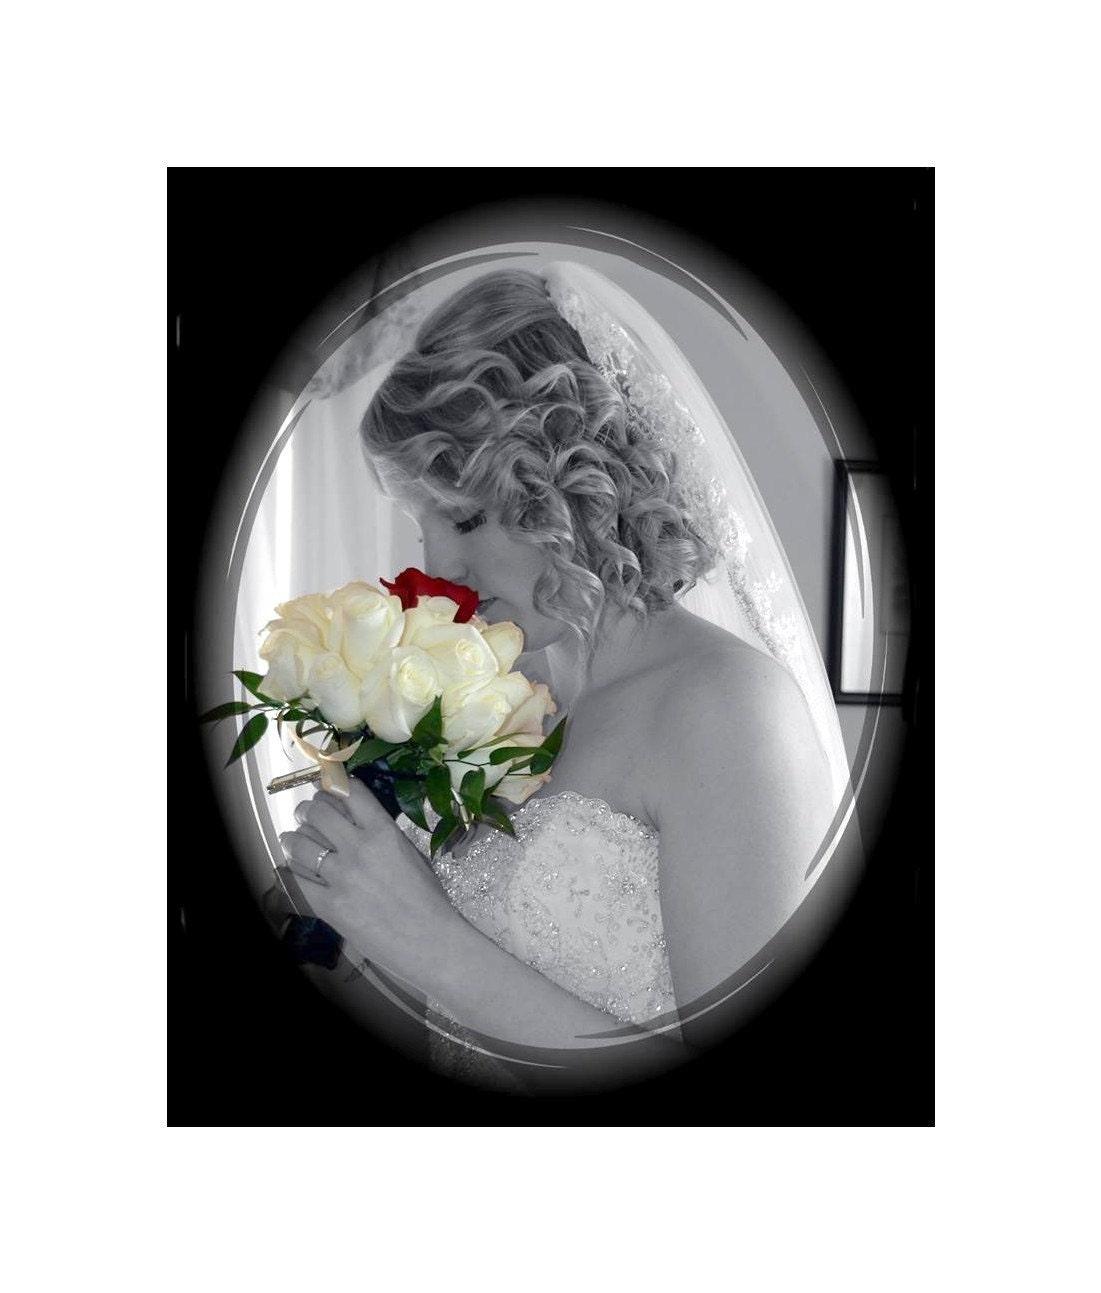 Bridal Bouquet Locket Charm : Bridal bouquet boutonniere charm wedding by lovesparisstudio